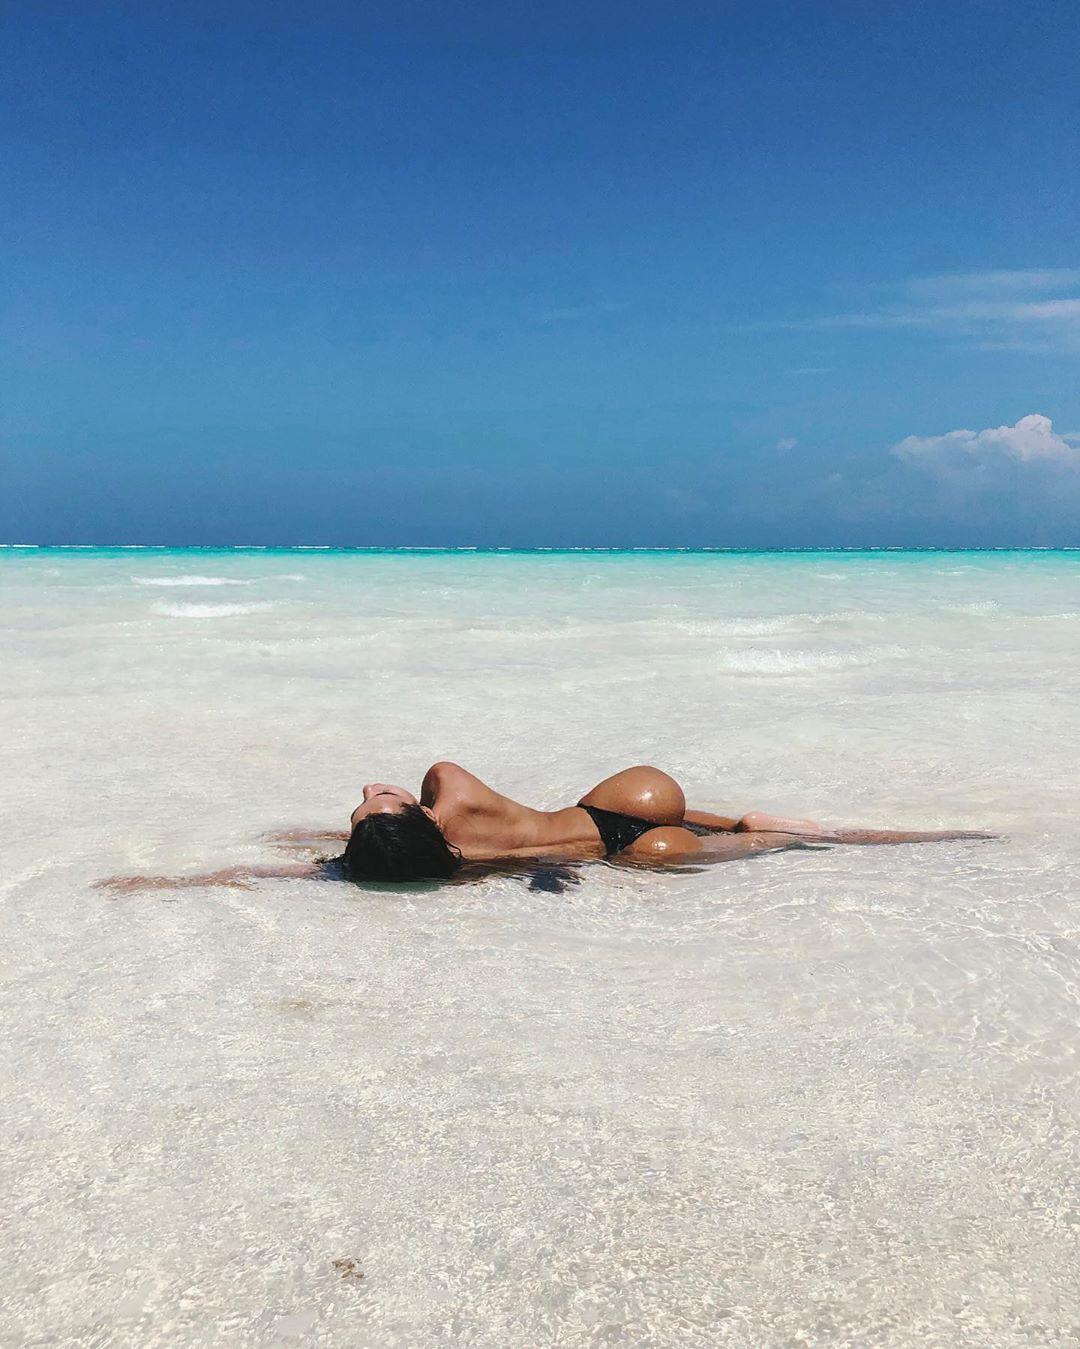 Adriana Hughes e o treino na praia que deixa meio mundo de boca aberta